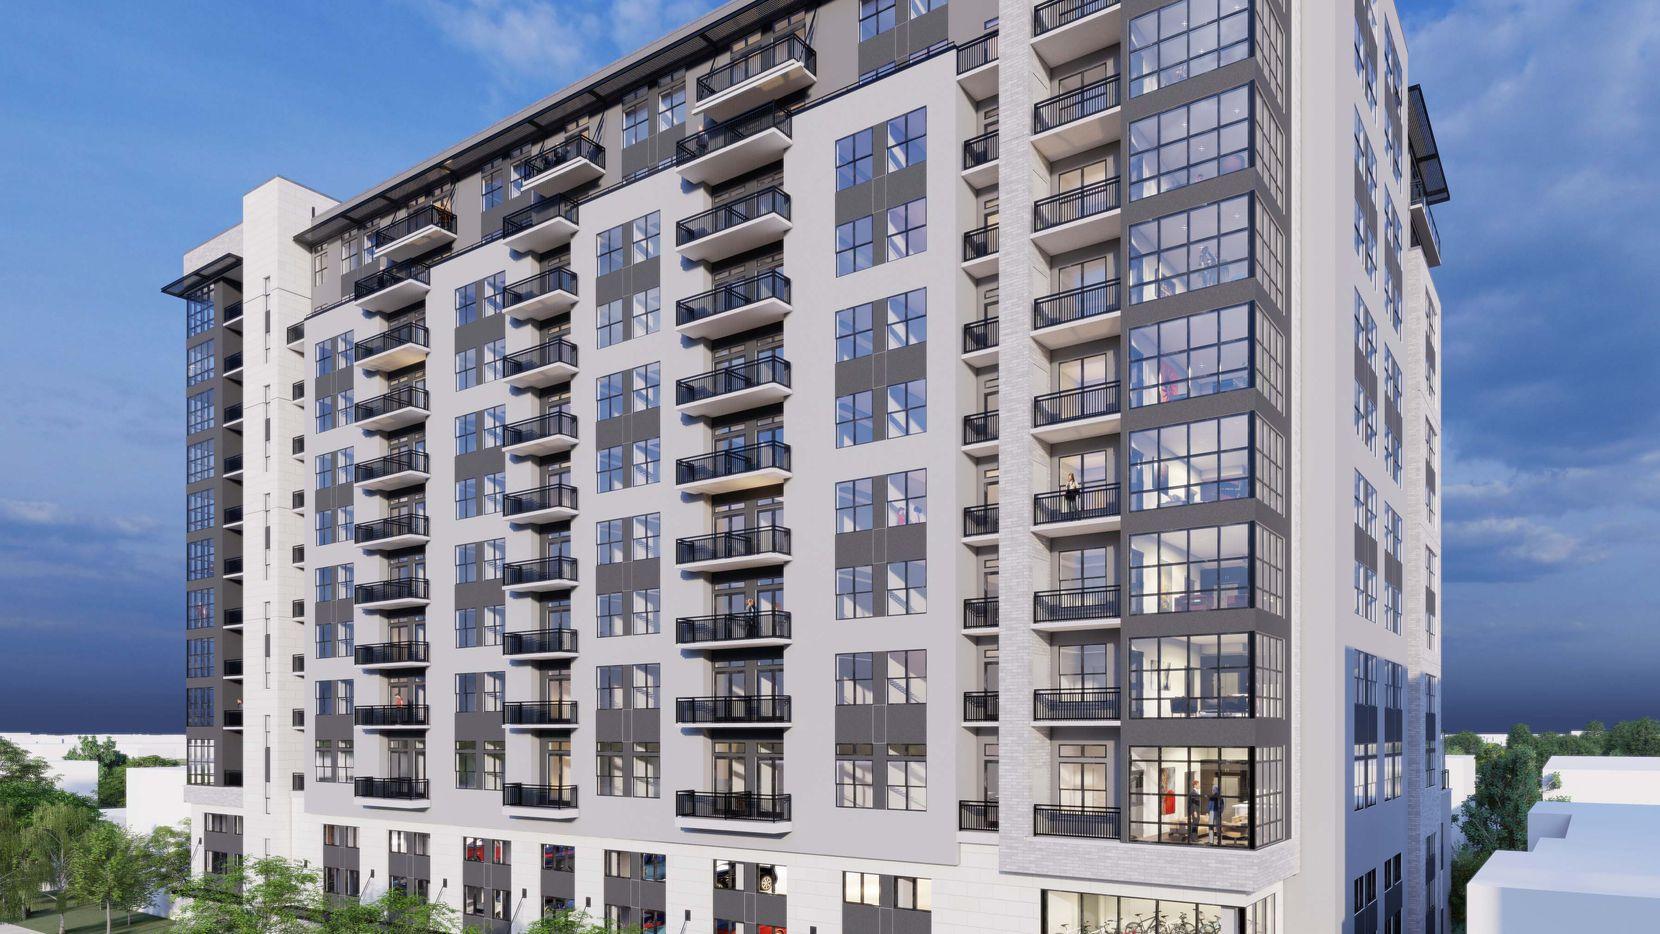 The Alexan Oak Grove apartment tower is being built on Oak Grove Avenue near Hall Stree